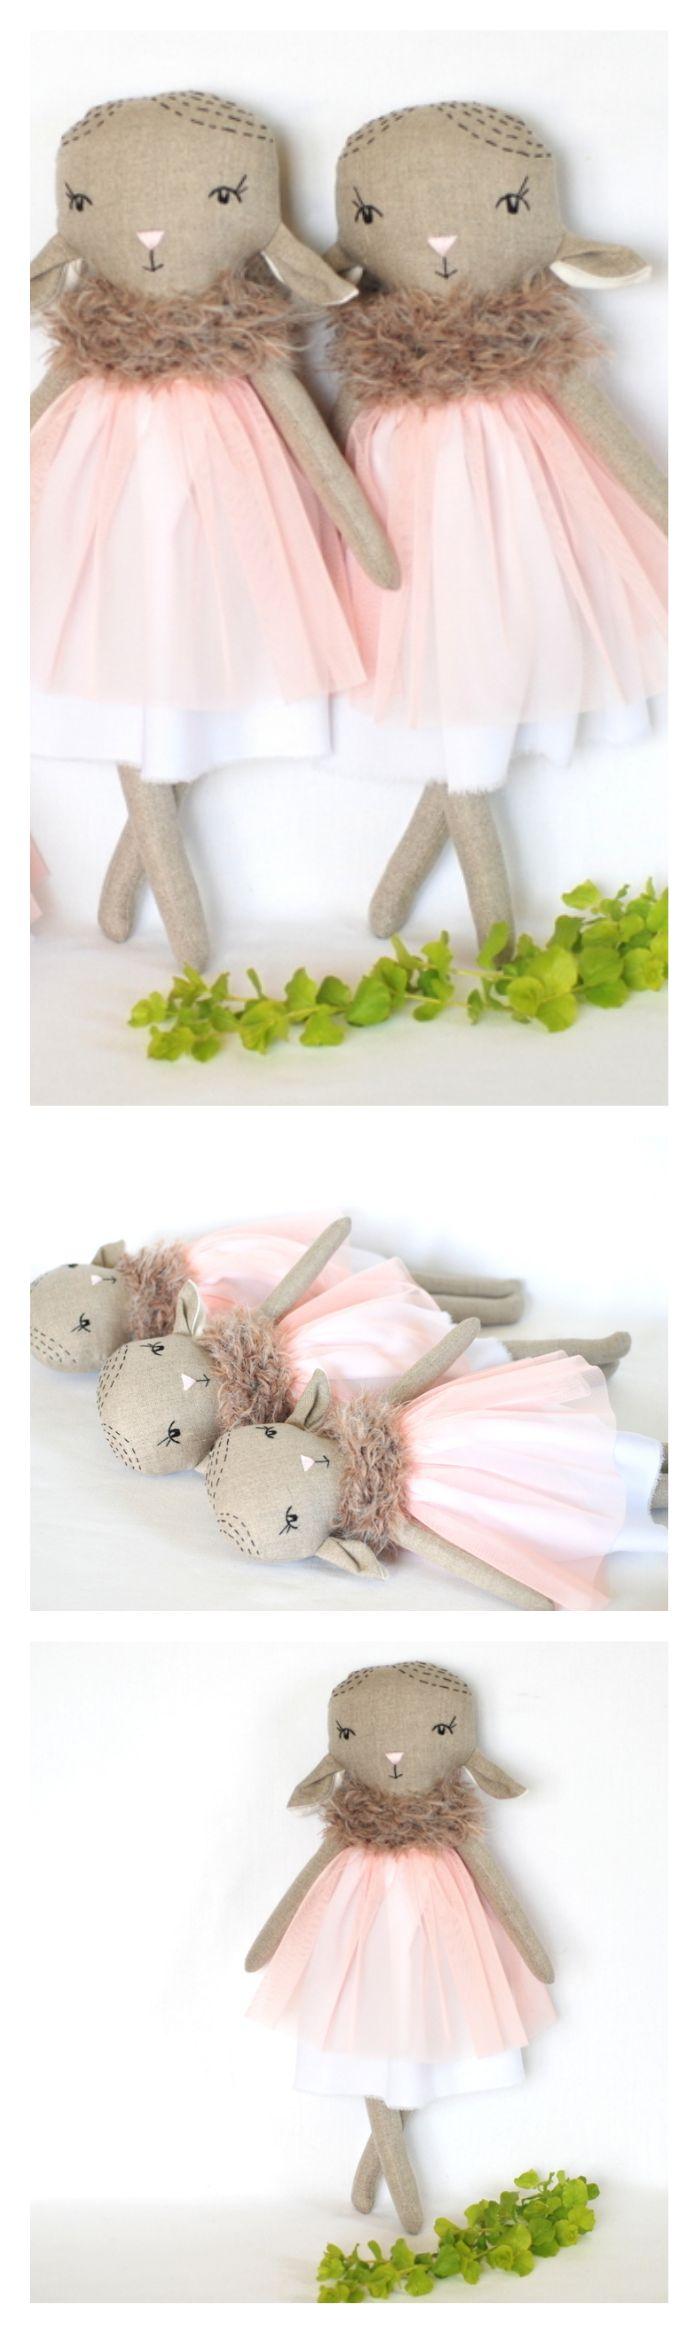 Linen lamb doll. Sheep rag doll. Stuffed lamb in homemade. Lamb cloth doll. Fabric dollmade by doll maker Jumata made. Handmade lamb toy.